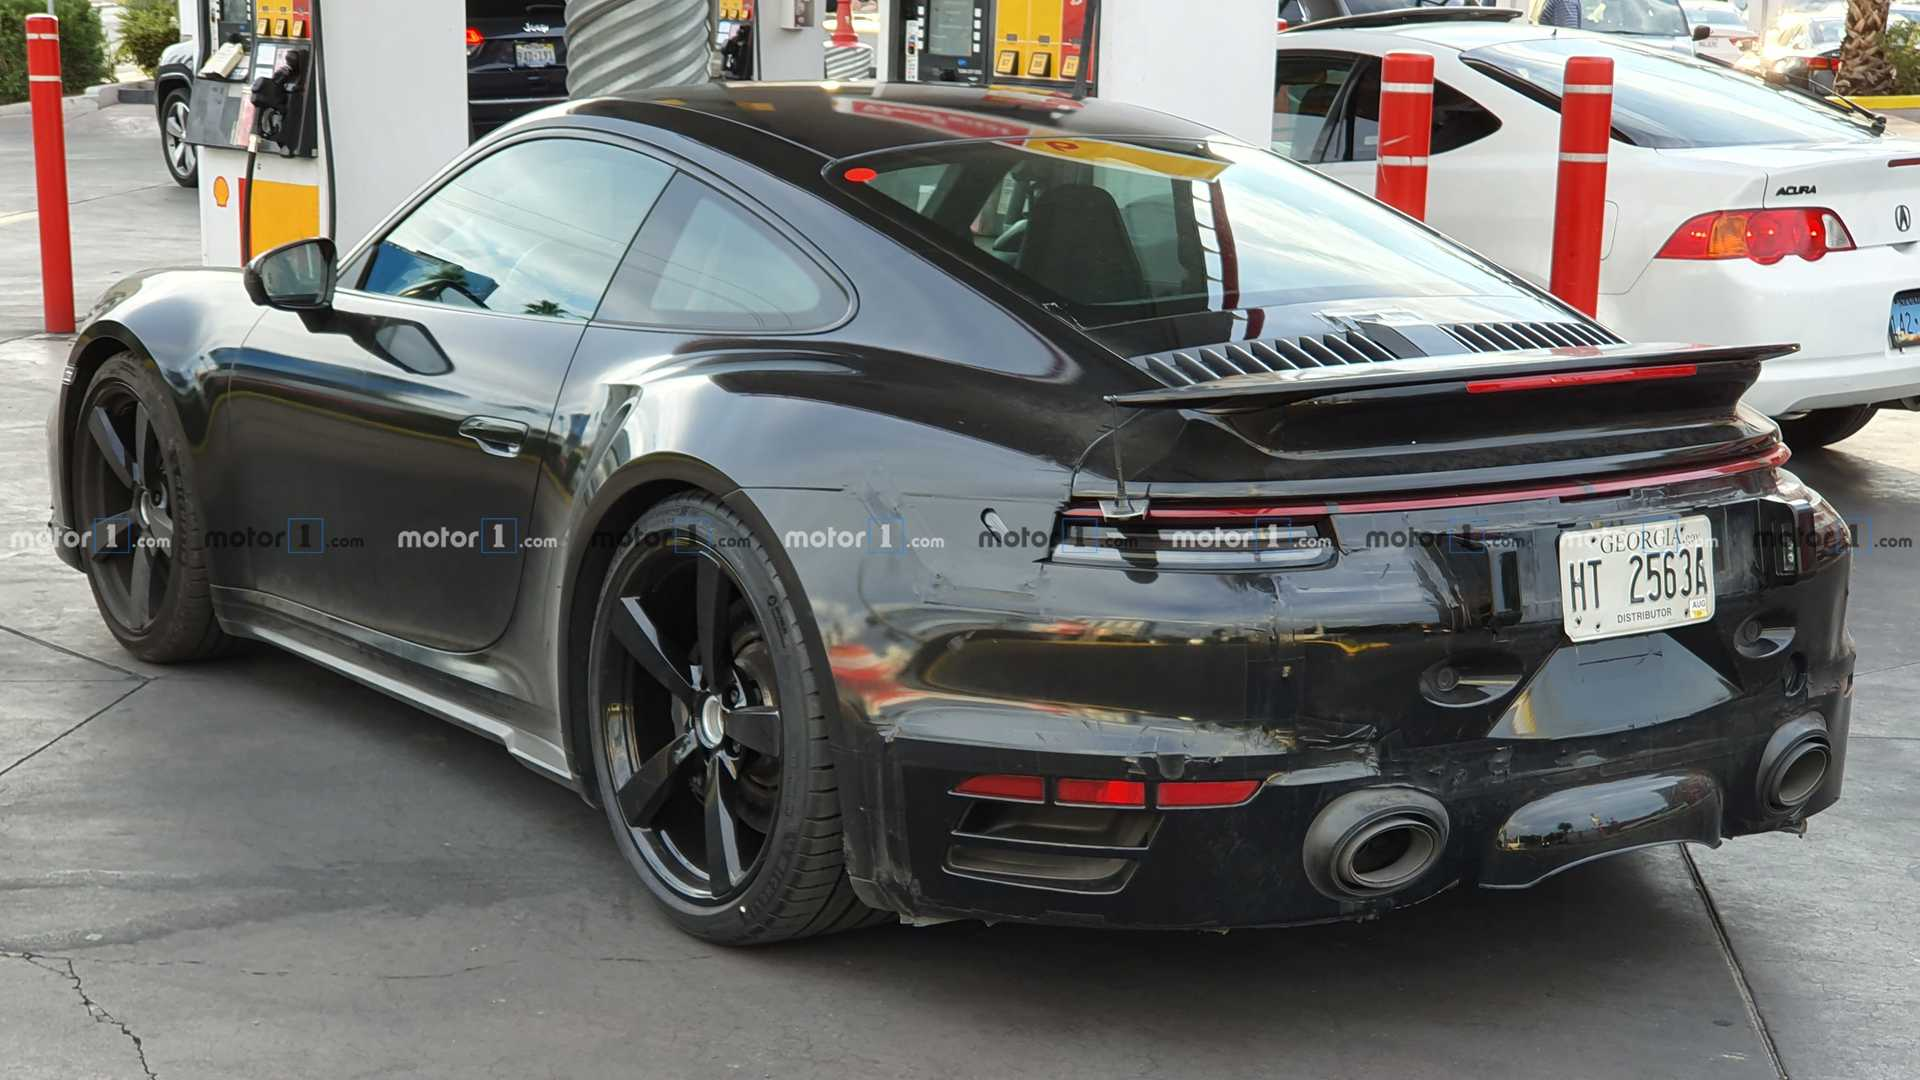 Next Gen Porsche 911 Turbo Spied Gassing And Going Update